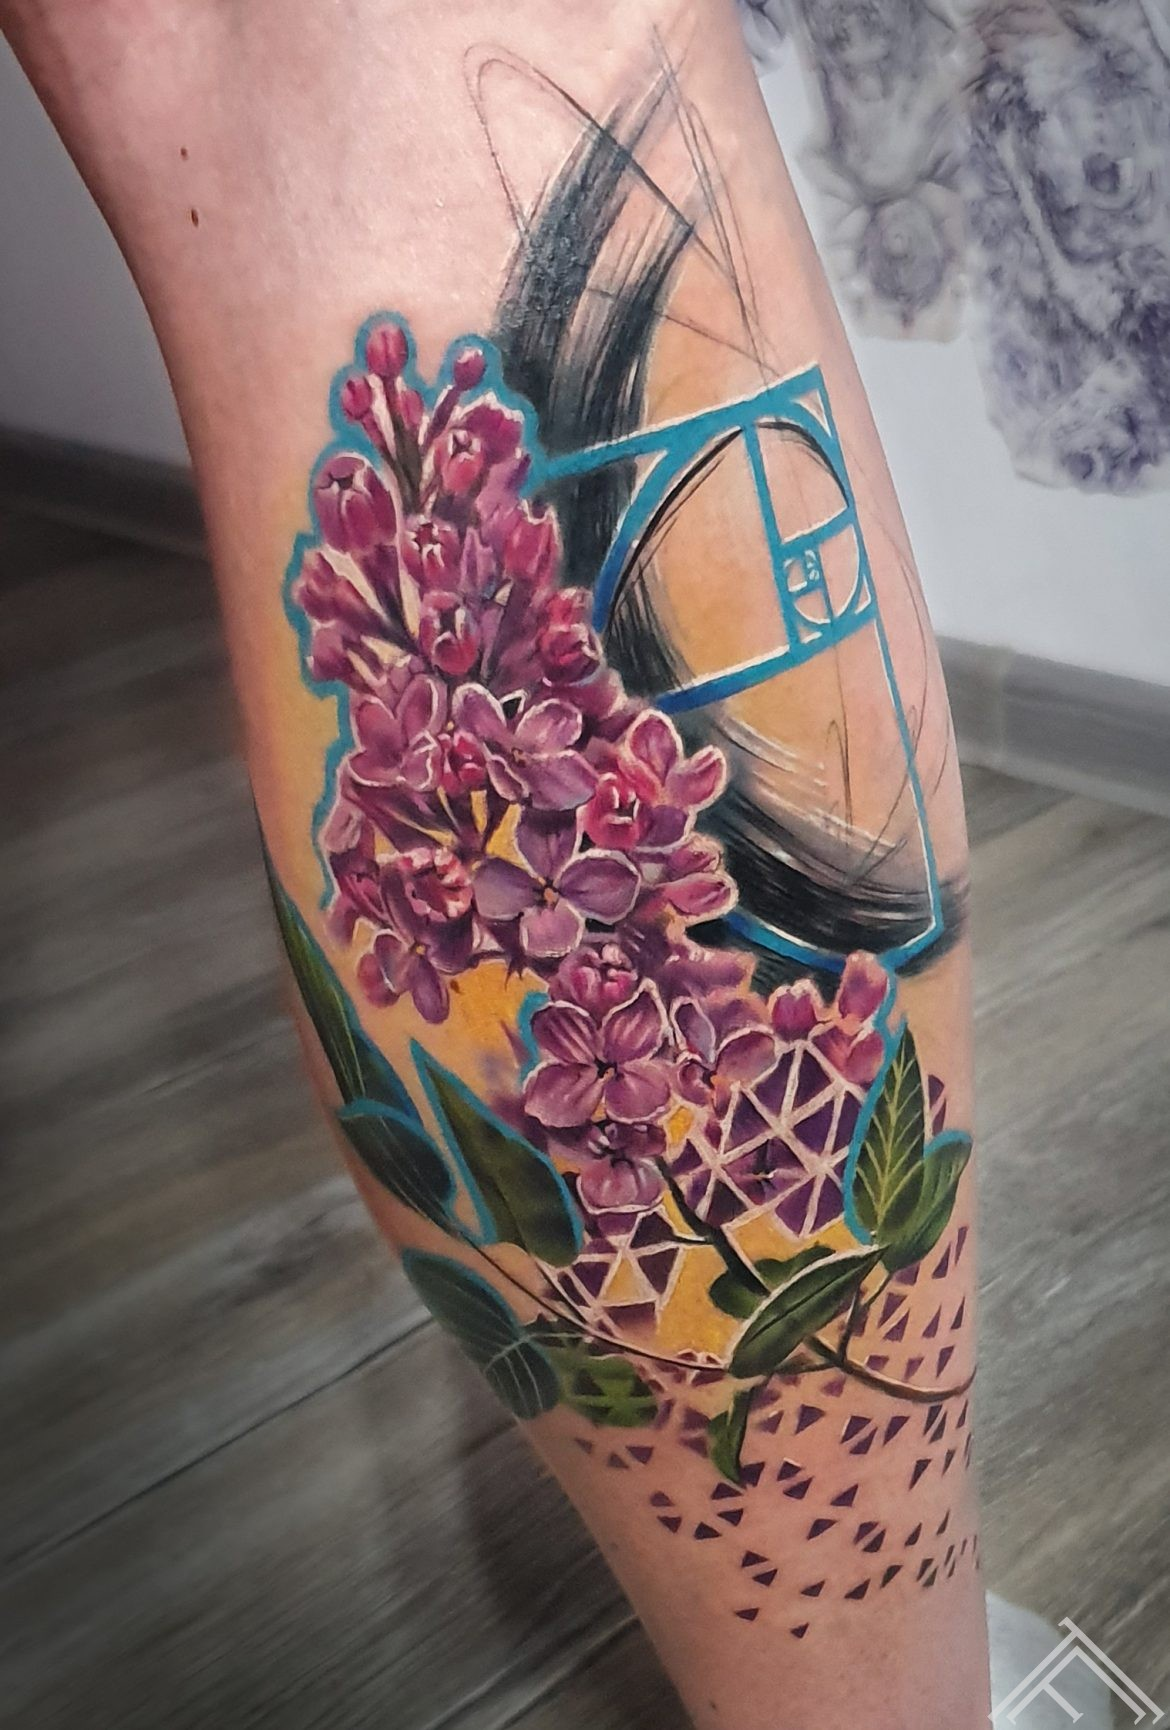 cerini-ziedi-lilac-flowers-fibonacci-tattoo-riga-art-maksla-tetovejums-rigastetovesanastudija-marispavlo-tetovetaji-m.lapa